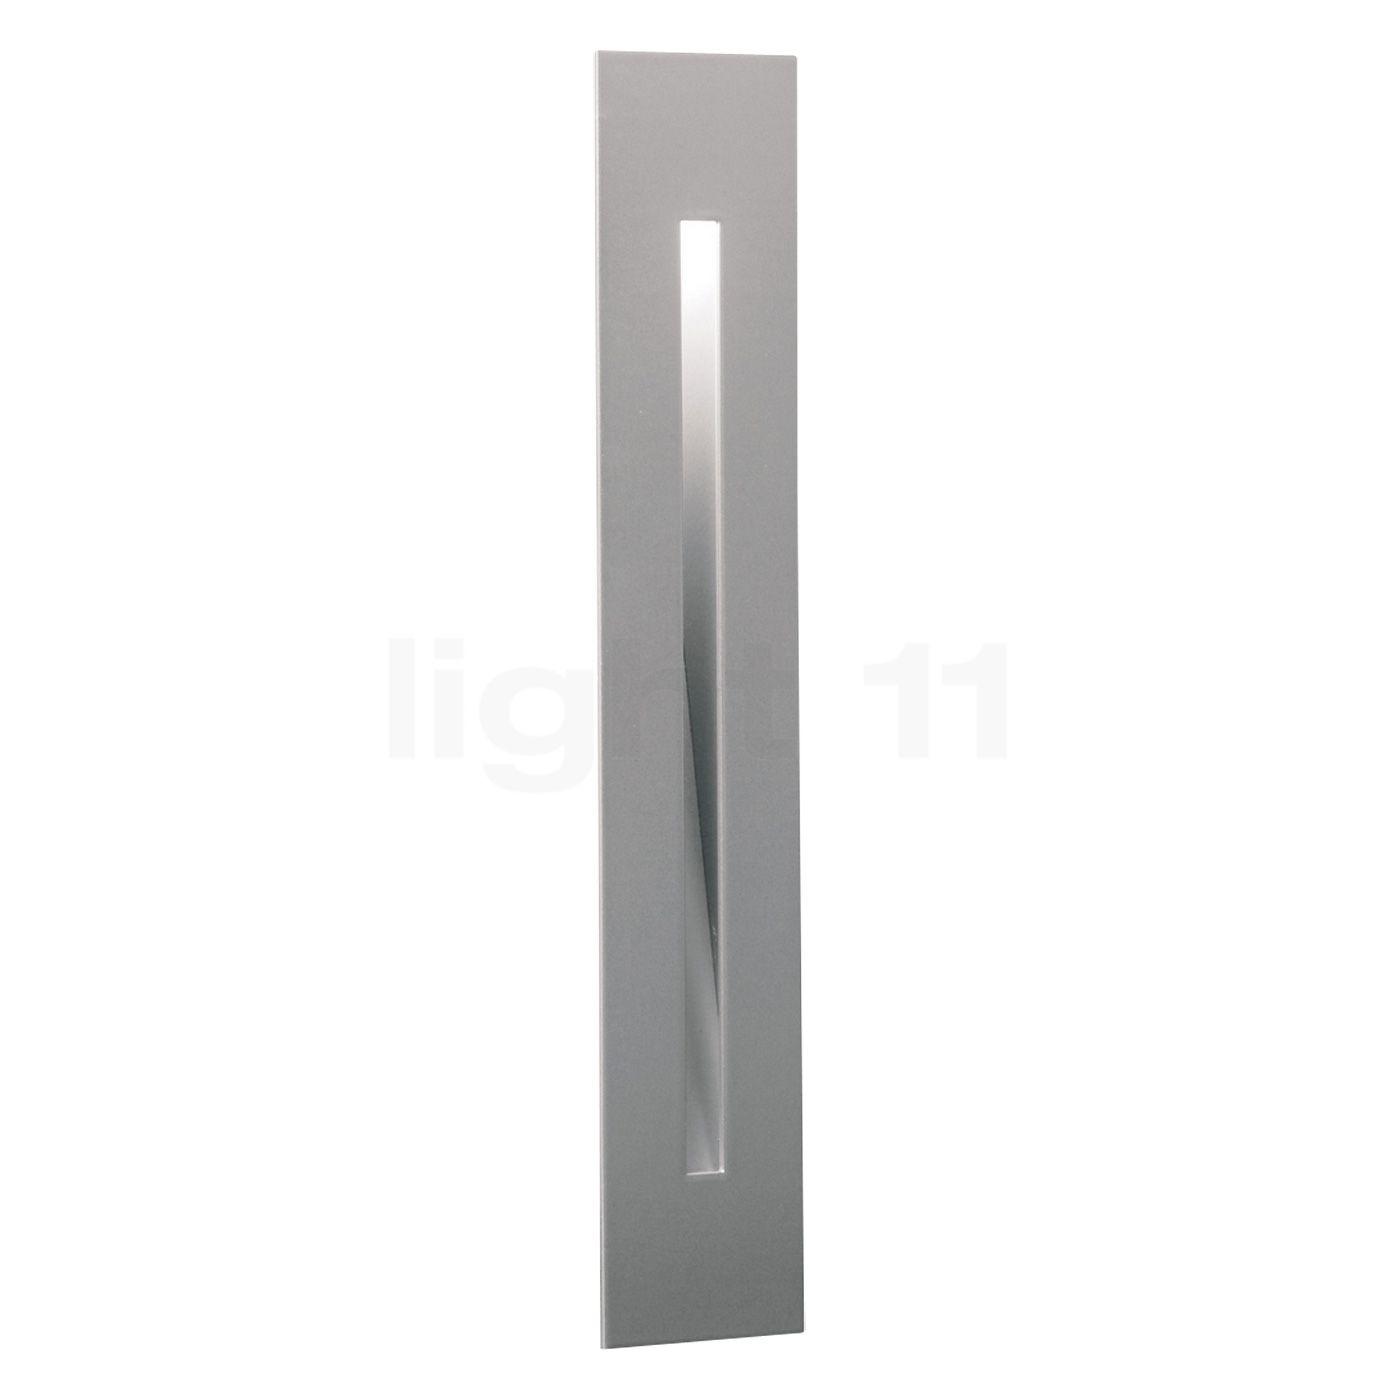 Buy delta light inlet s nw at light11 aloadofball Images